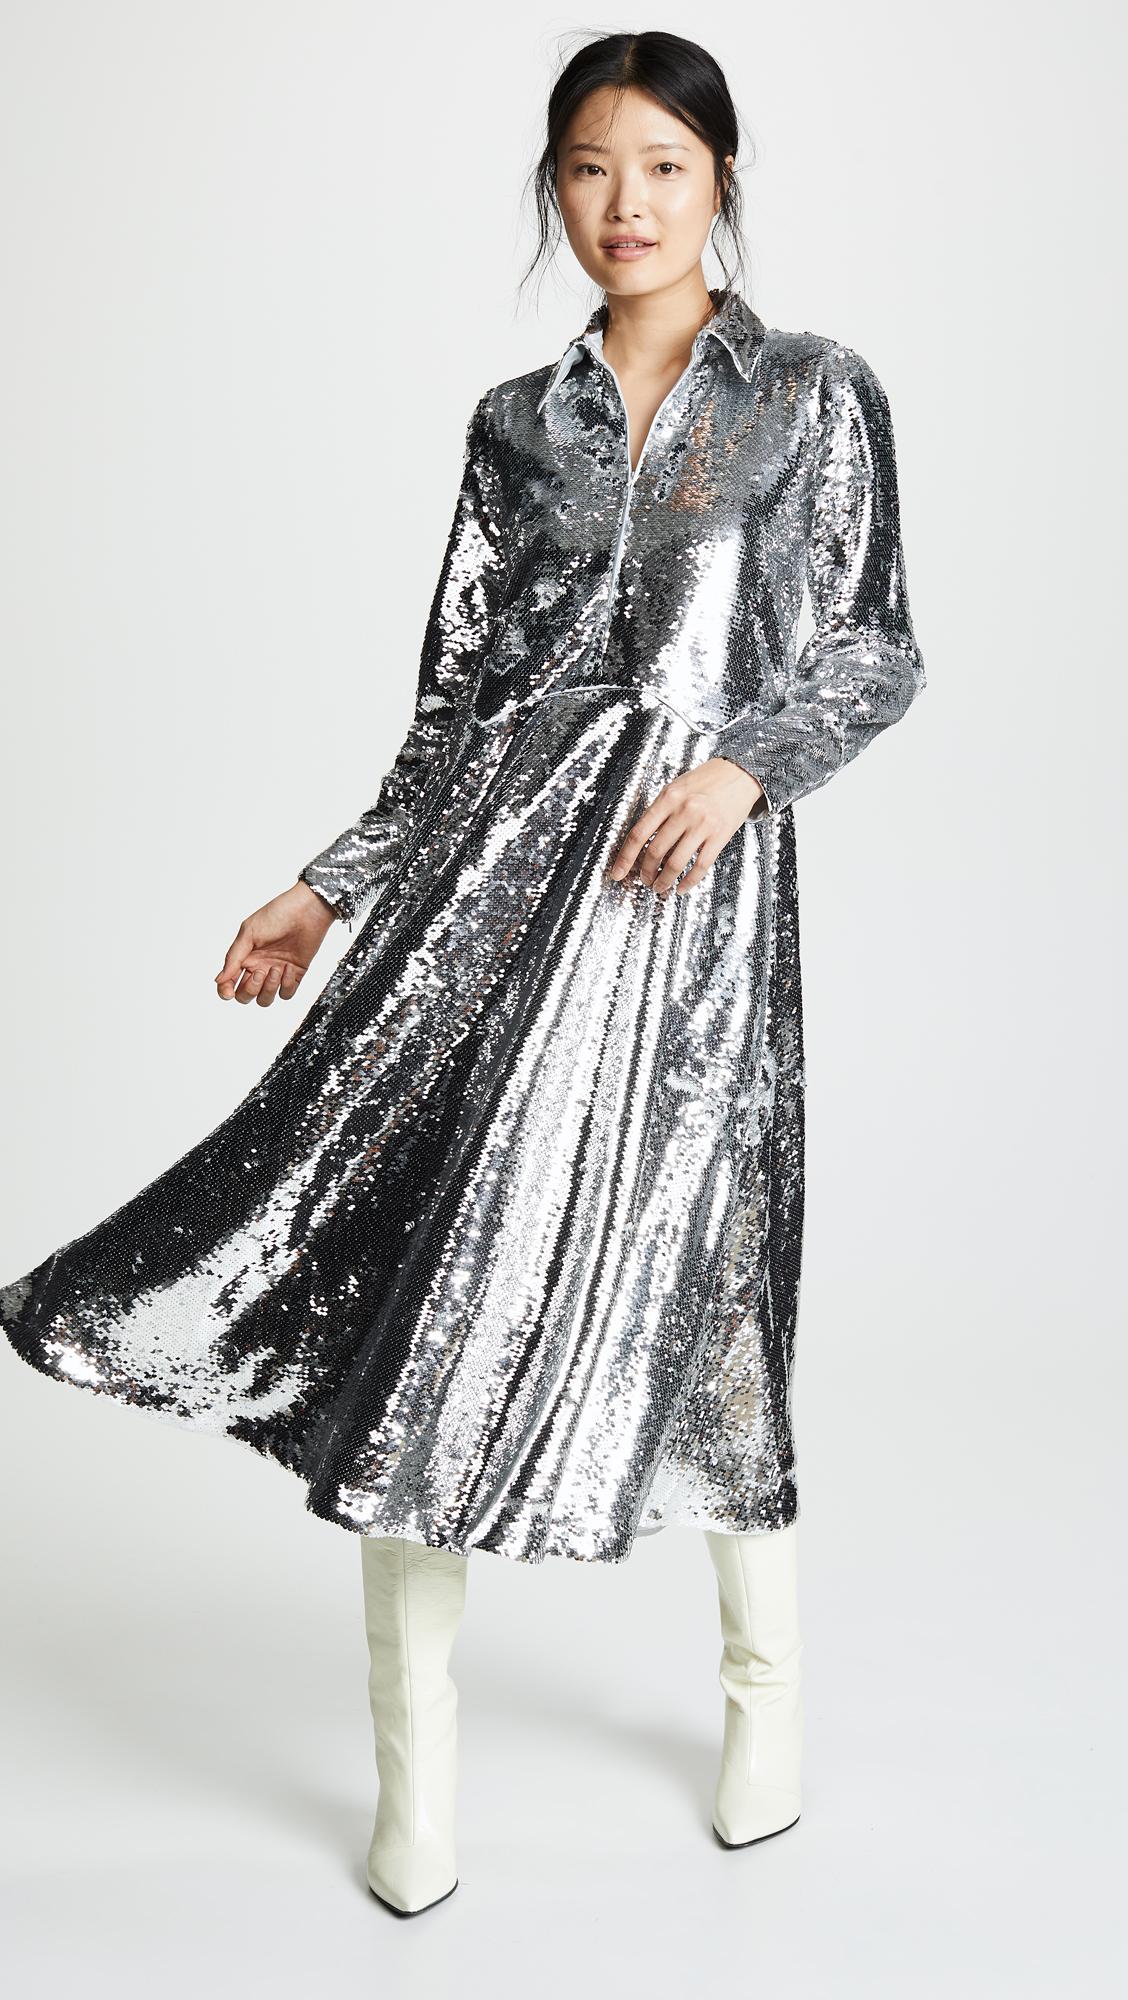 b16ba5ee0685 Dress Ganni Dress Ganni Shopbop Sequins Sequins Sequins Dress Ganni ...